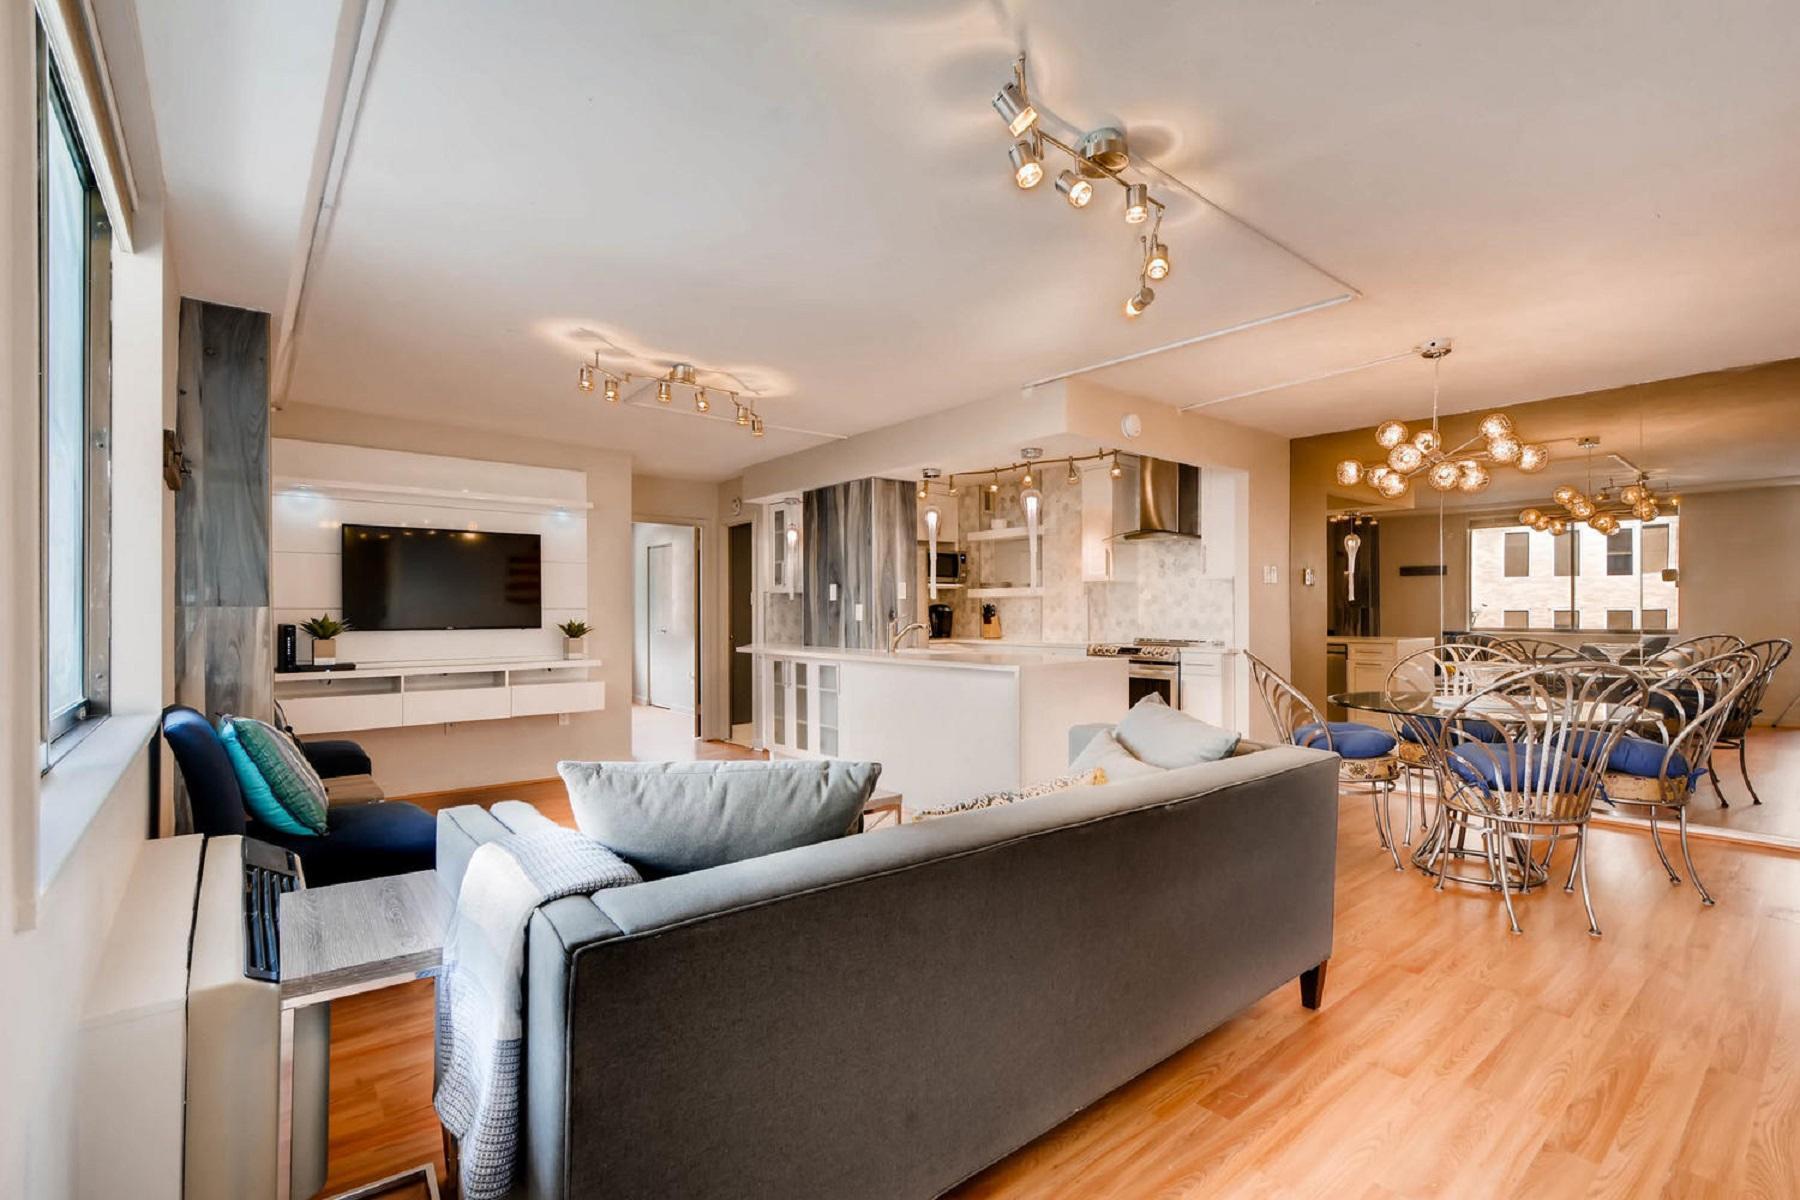 1325 18th St NW #410 For Rent - Washington, DC | Trulia